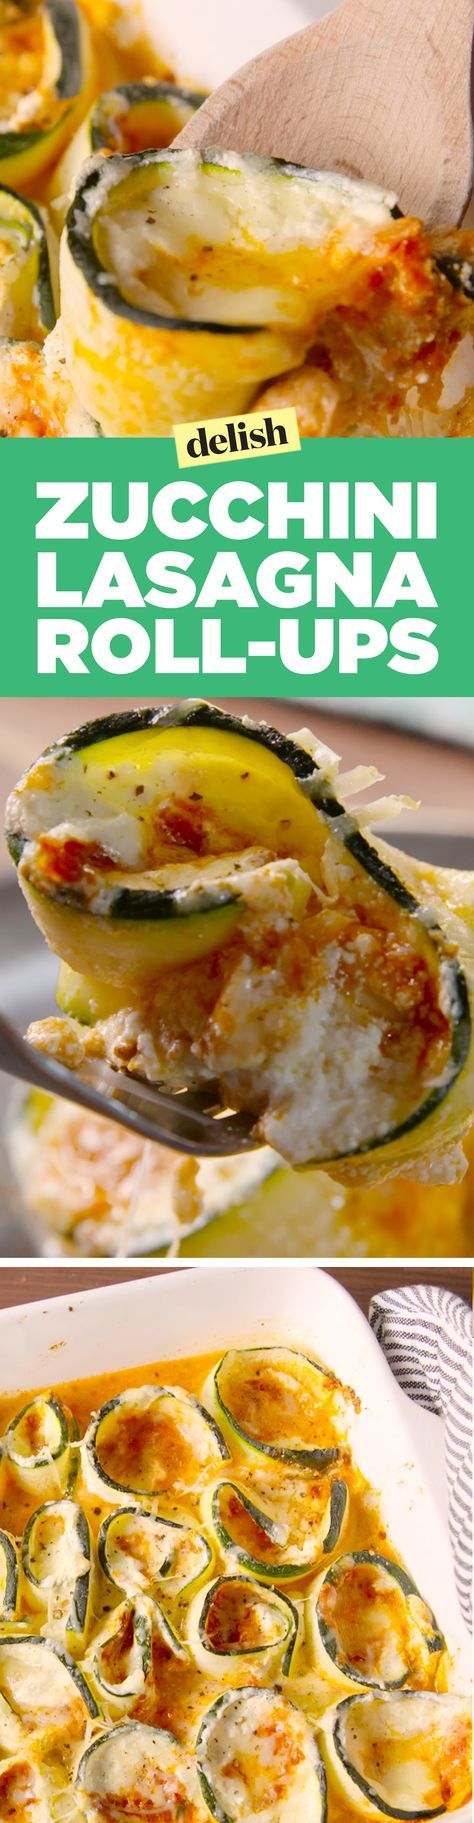 Zucchini lasagna roll-ups are #SummerPastaGoals. Get the recipe on Delish.com.